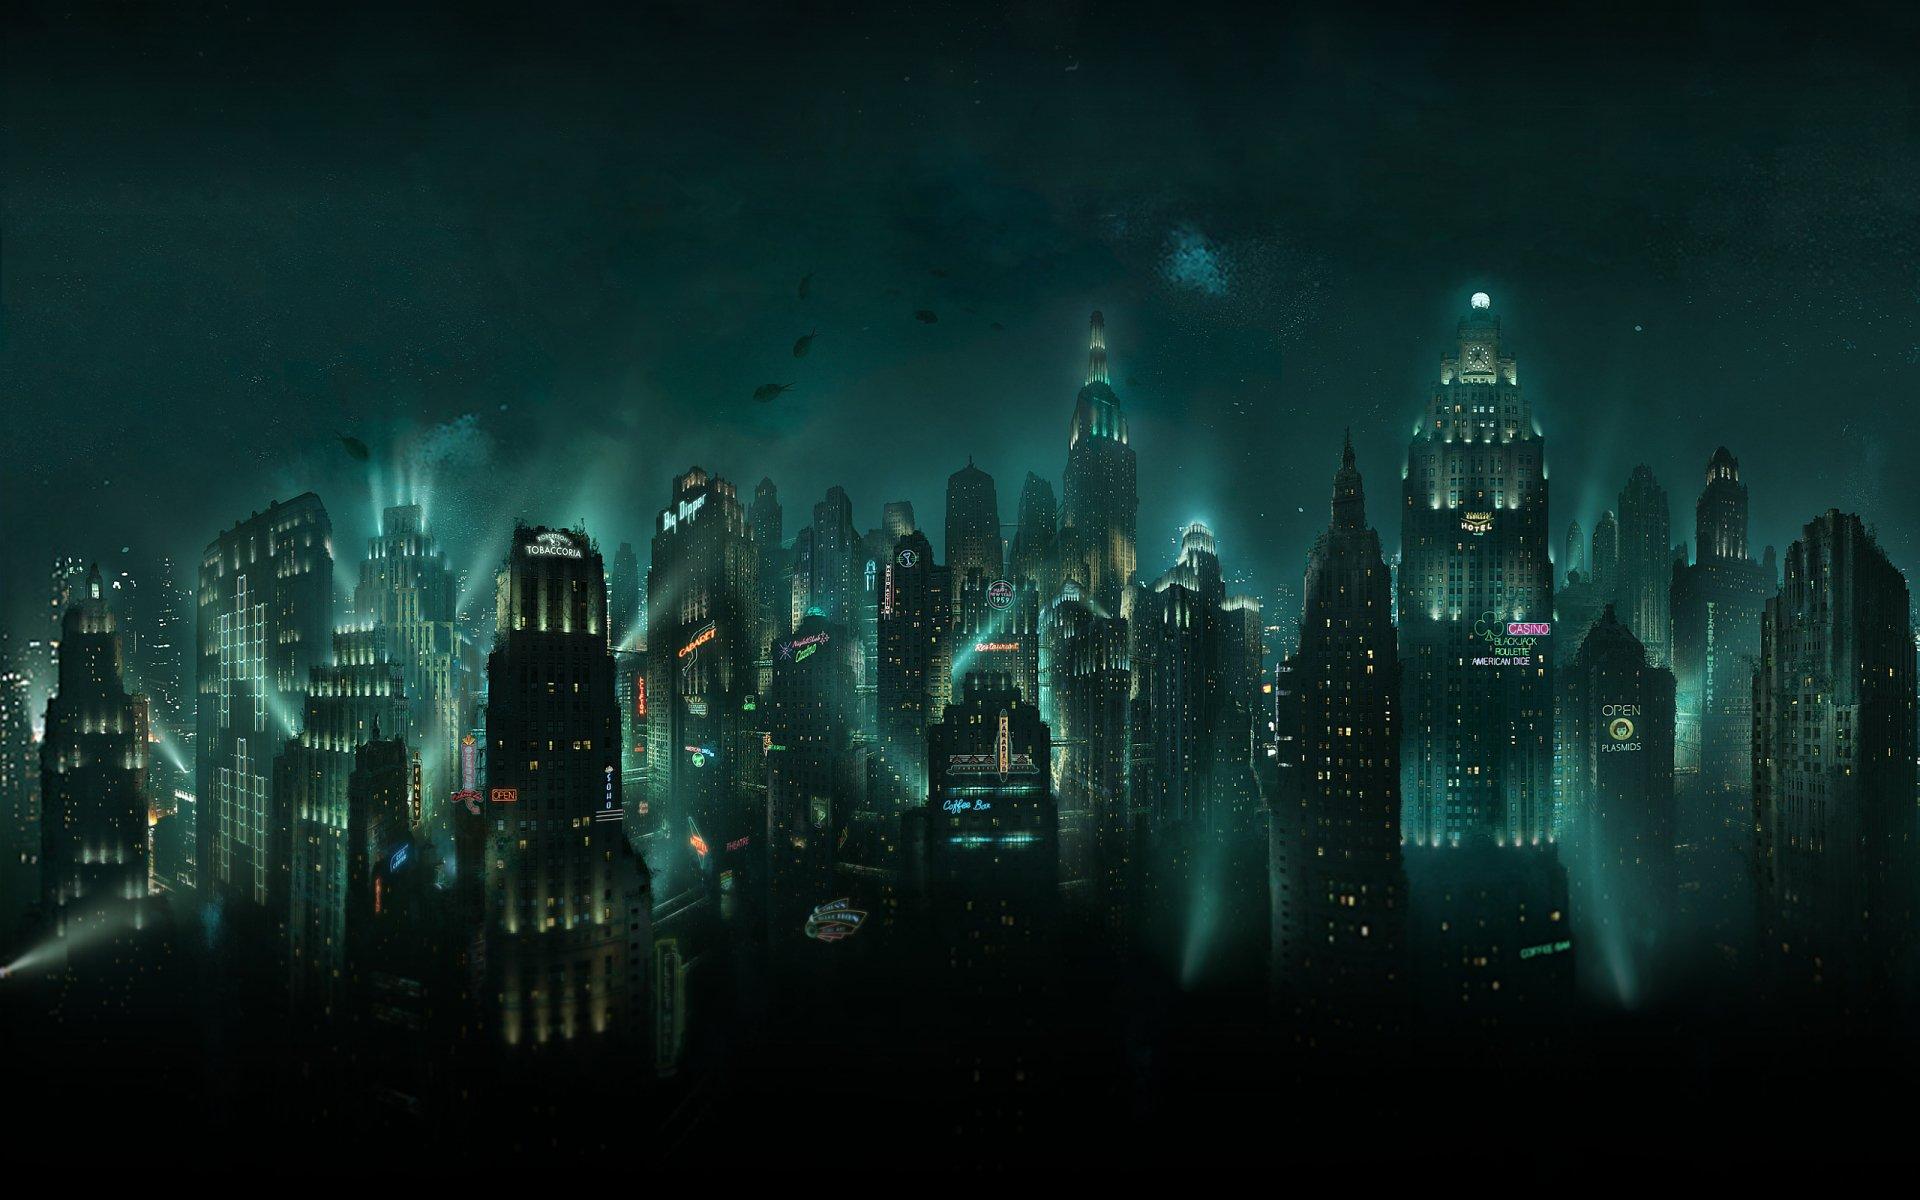 Bioshock wallpaper – Your Designer wallpaper